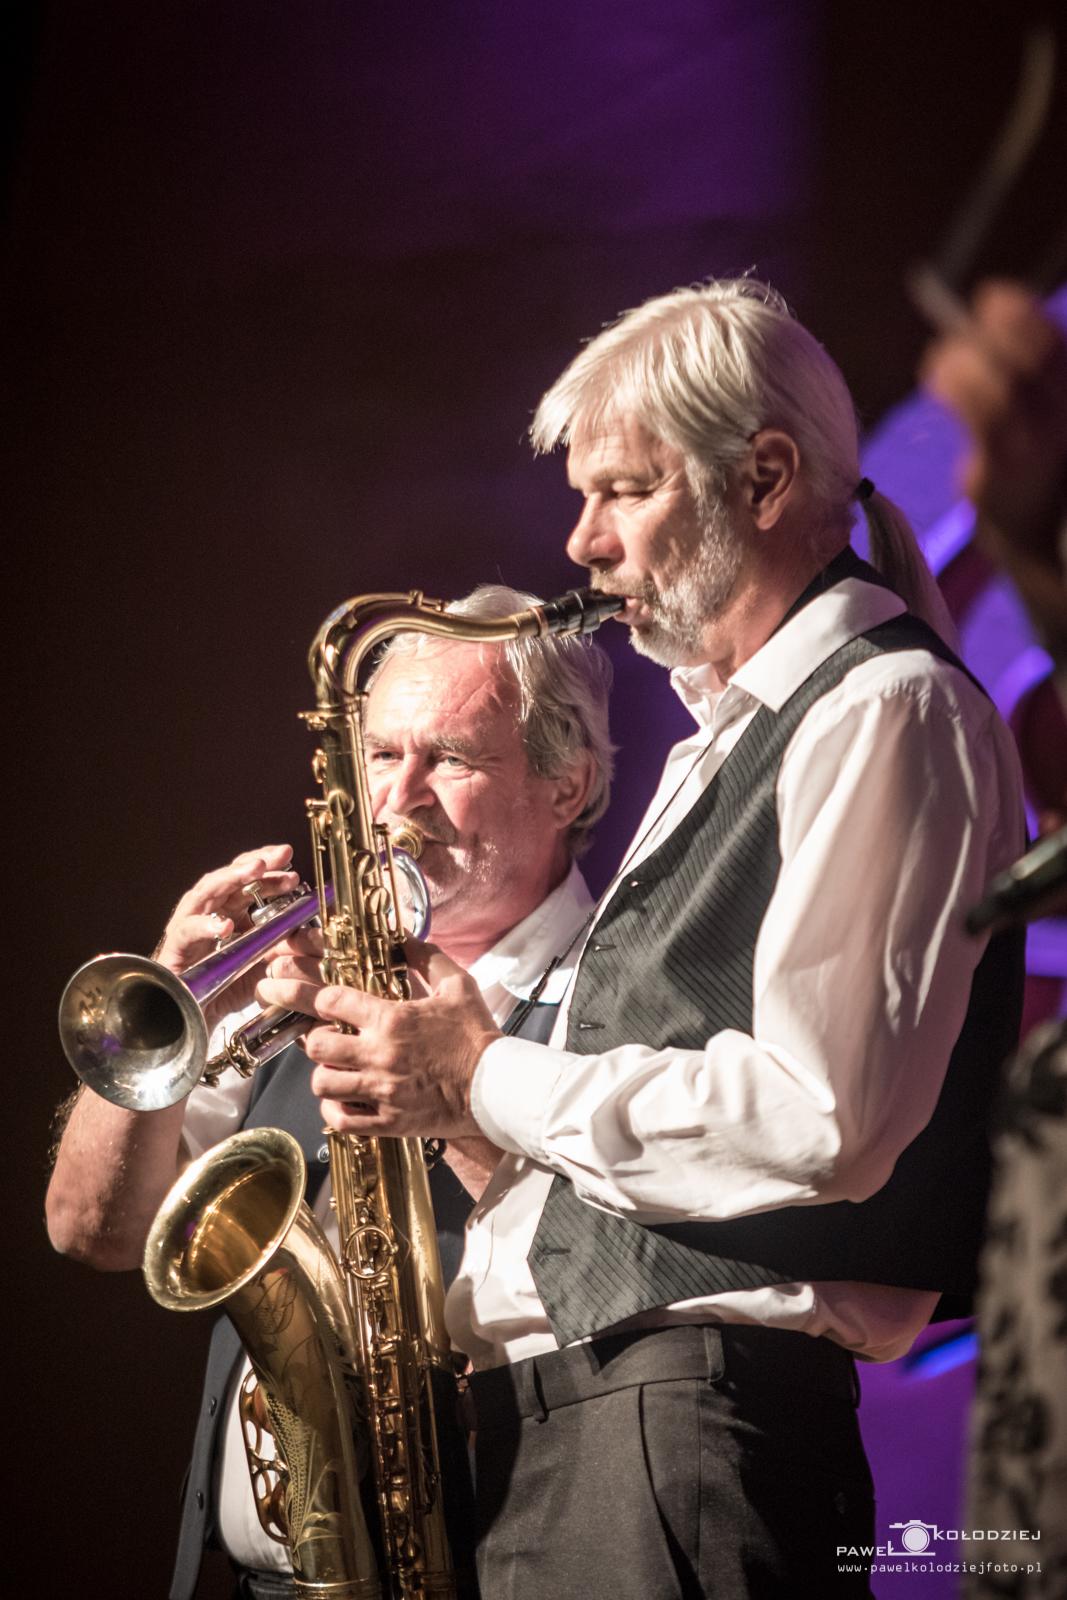 Gala - Revival Swing Band Praha (Czechy) (14)